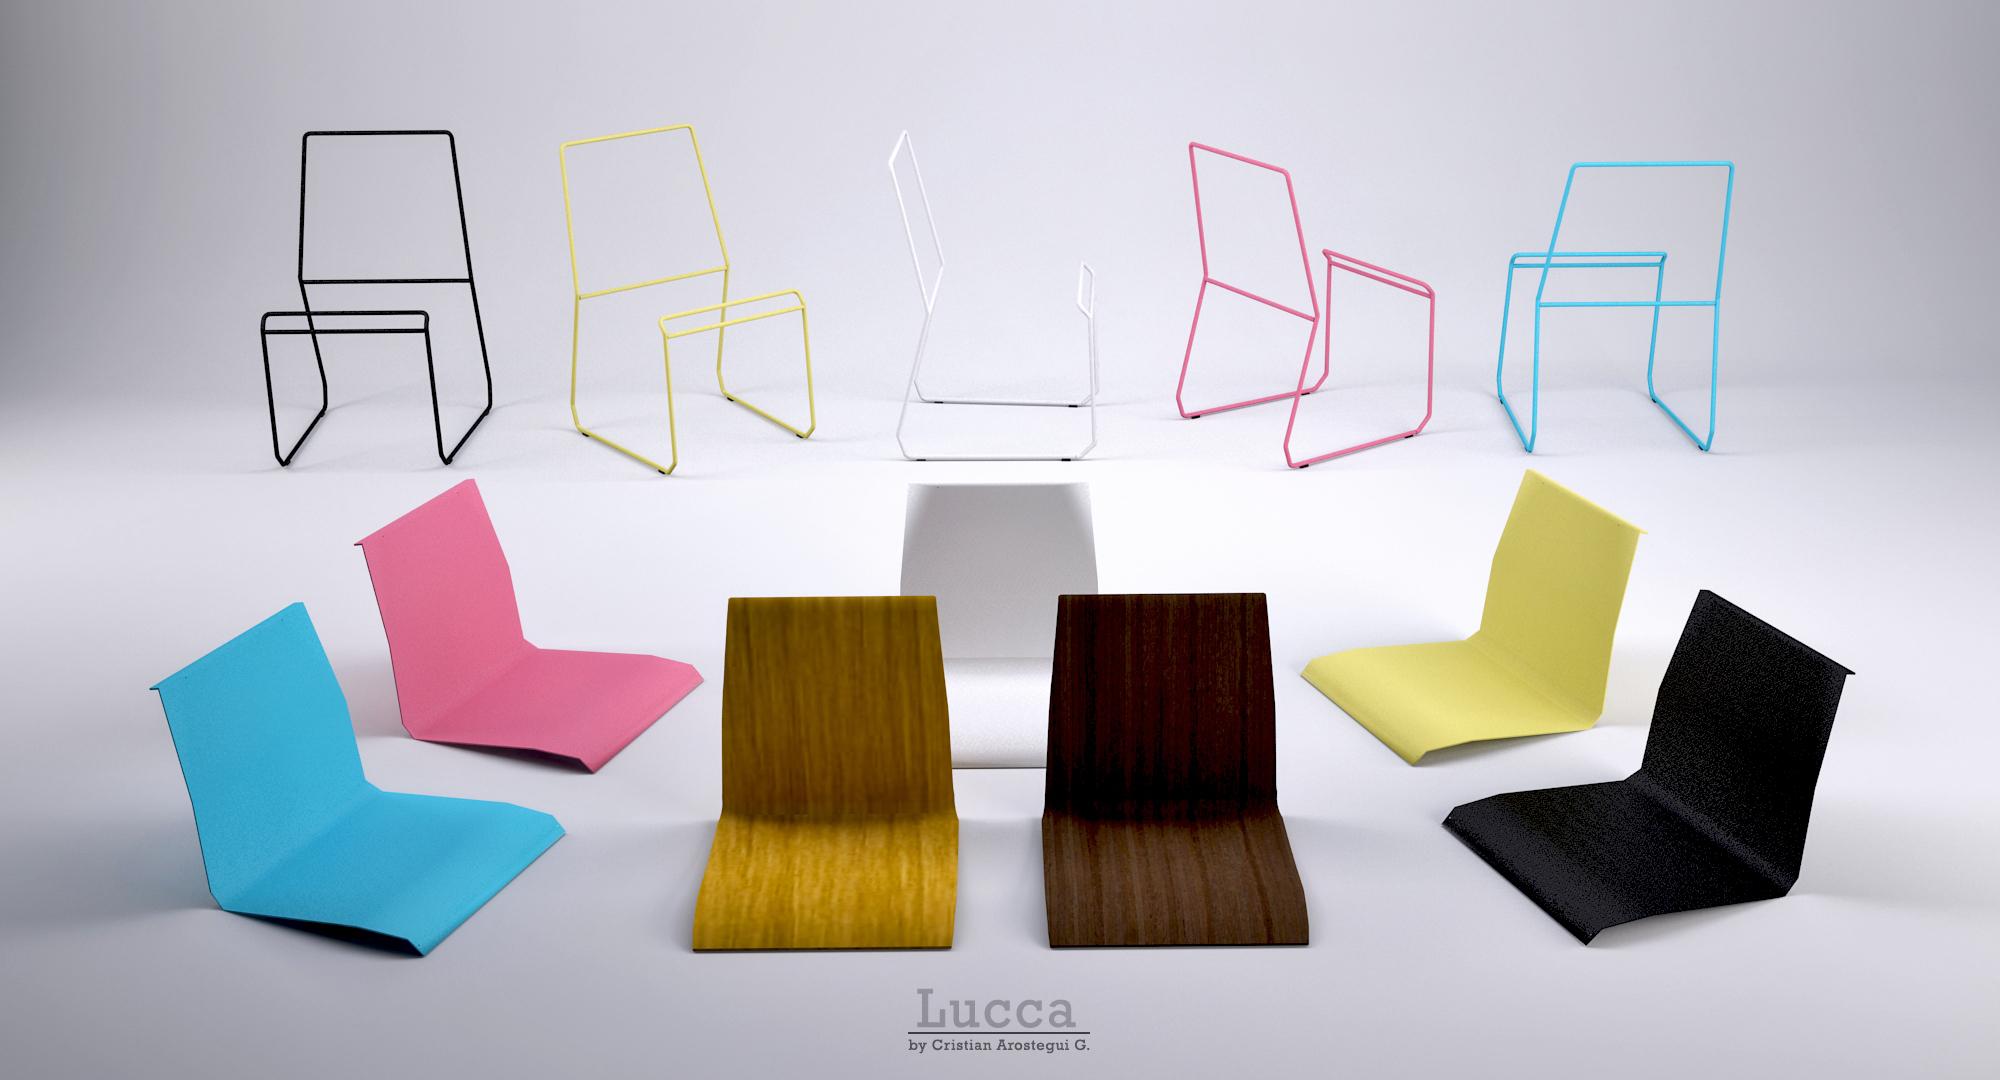 Lucca chair 3- cristian Arostegui- formabilio contest- Arostegui Studio.jpg